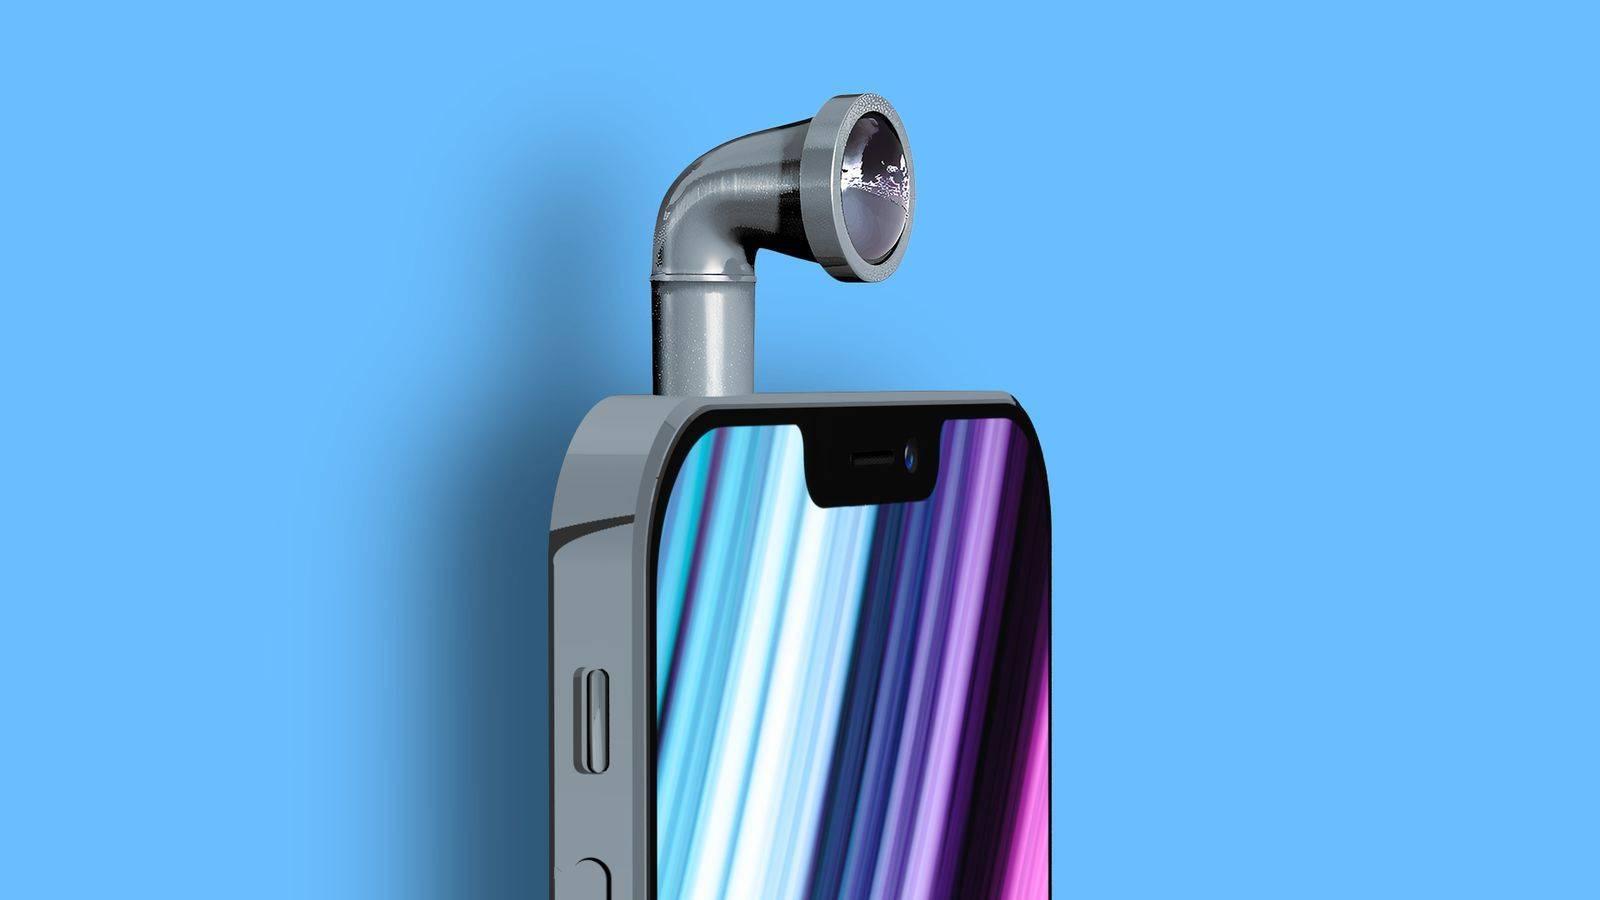 iPhone 要上潜望式镜头了,但我敢说当前的「长焦